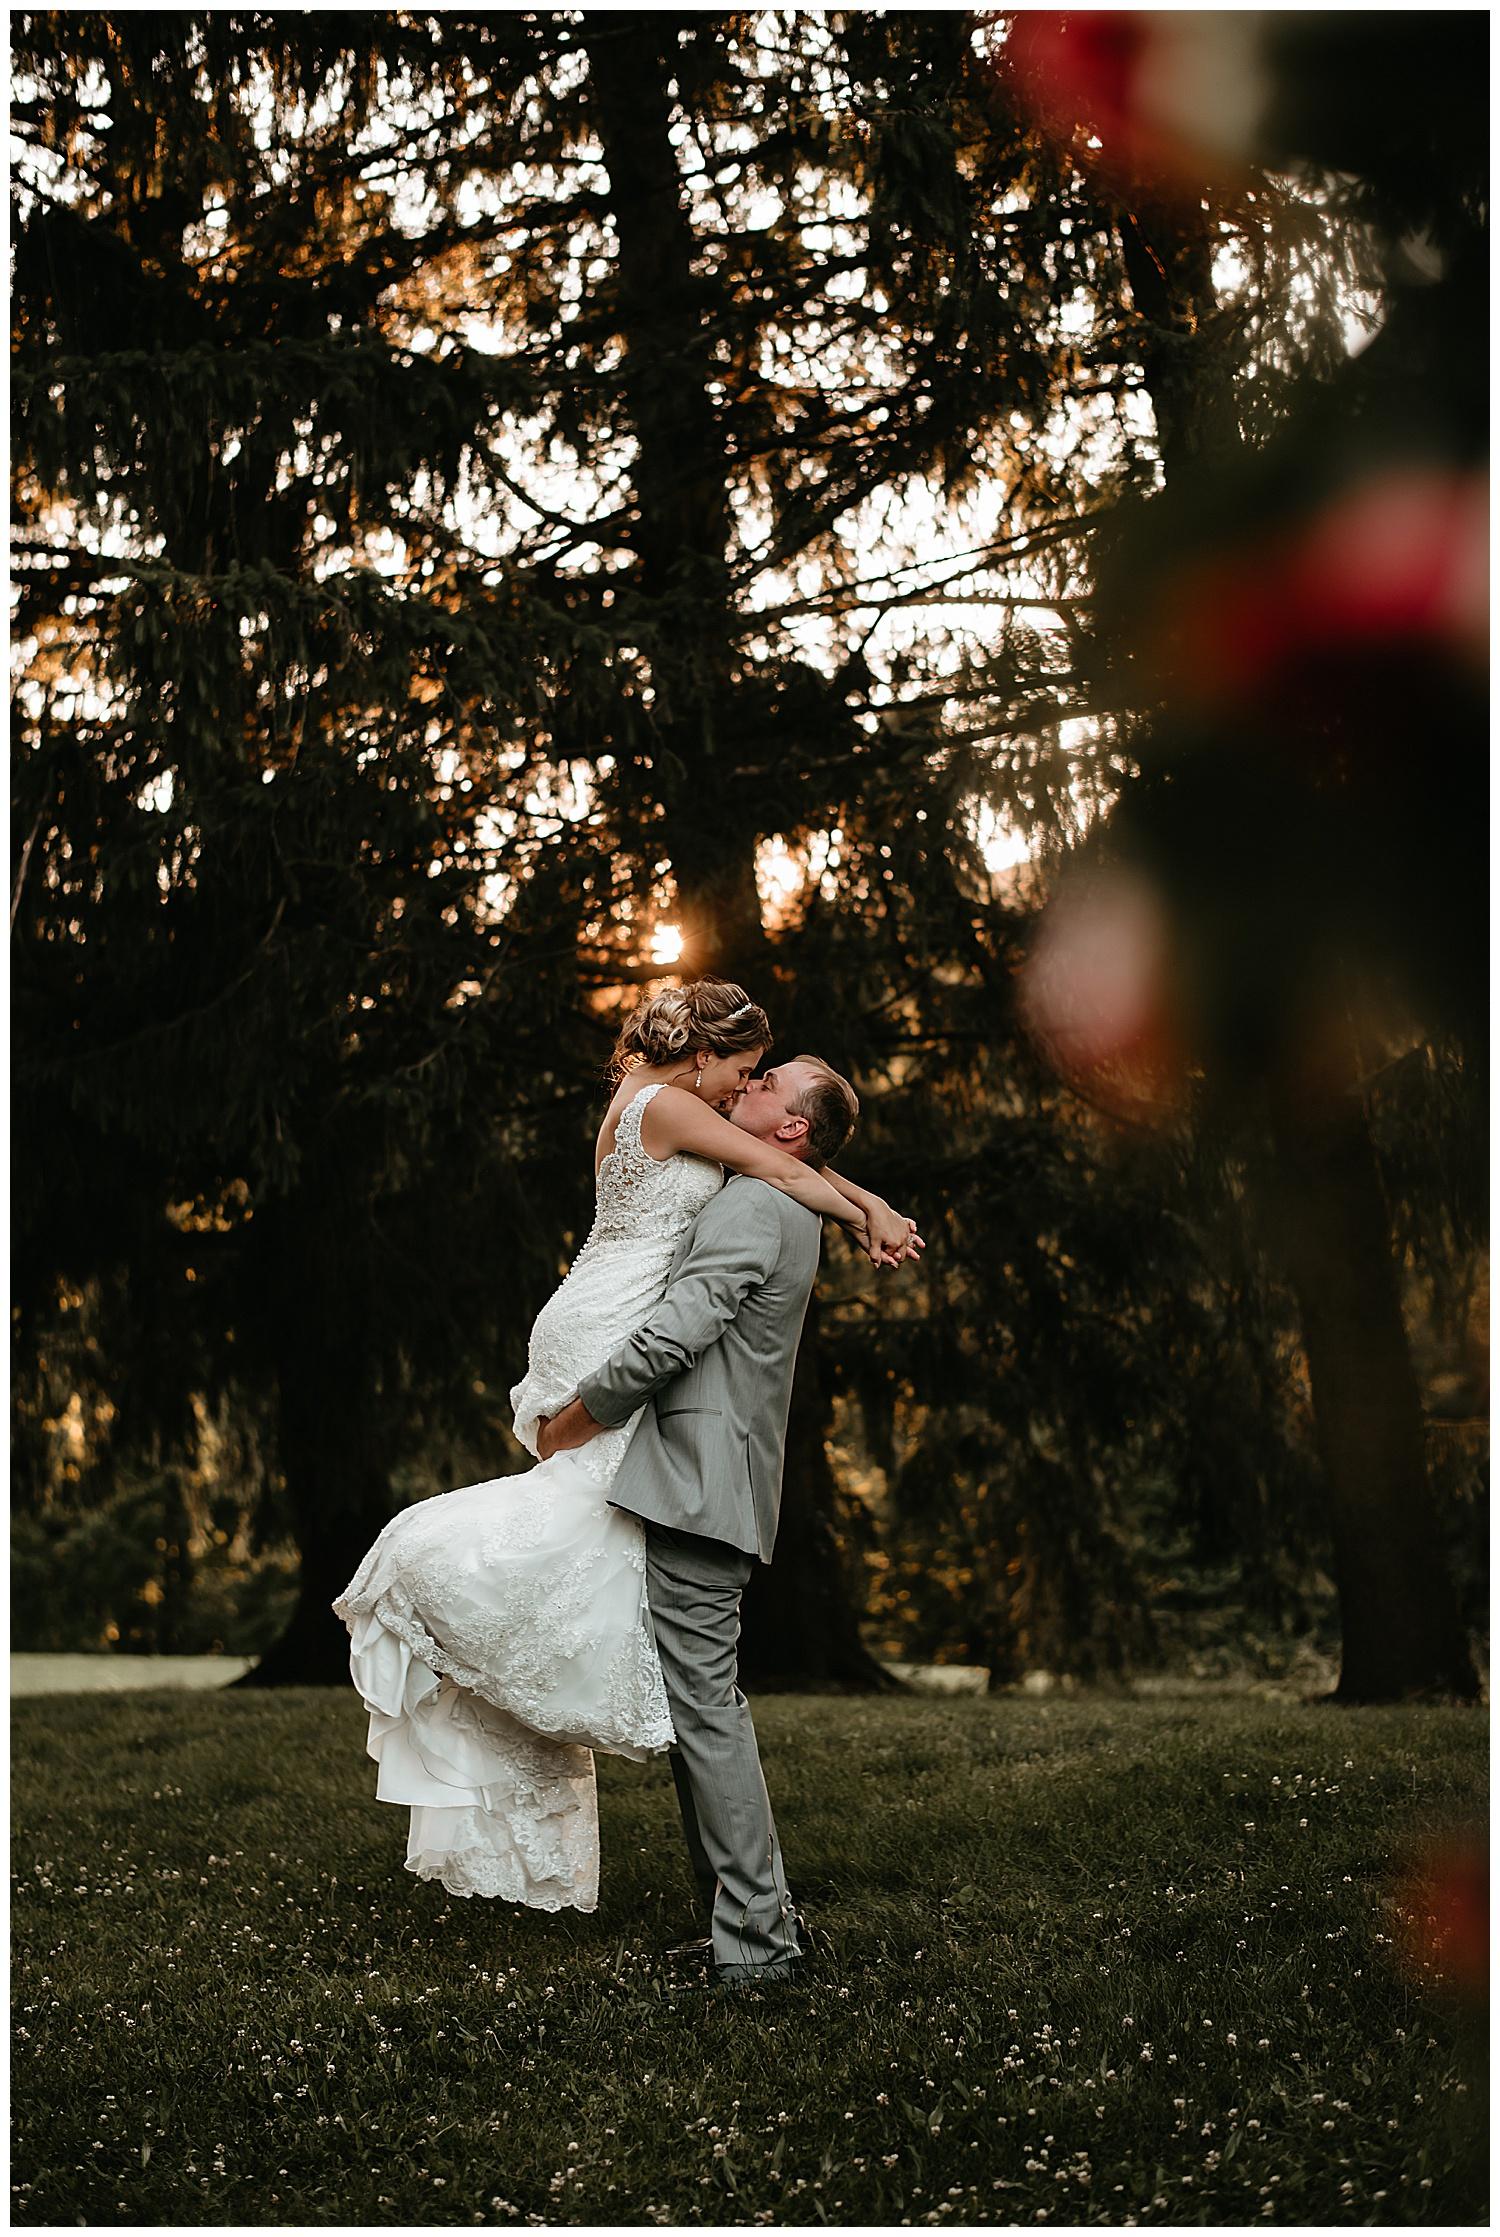 NEPA-Lehigh-Valley-Wedding-Photographer-at-Fountain-Springs-Country-Inn-Ashland-PA_0063.jpg